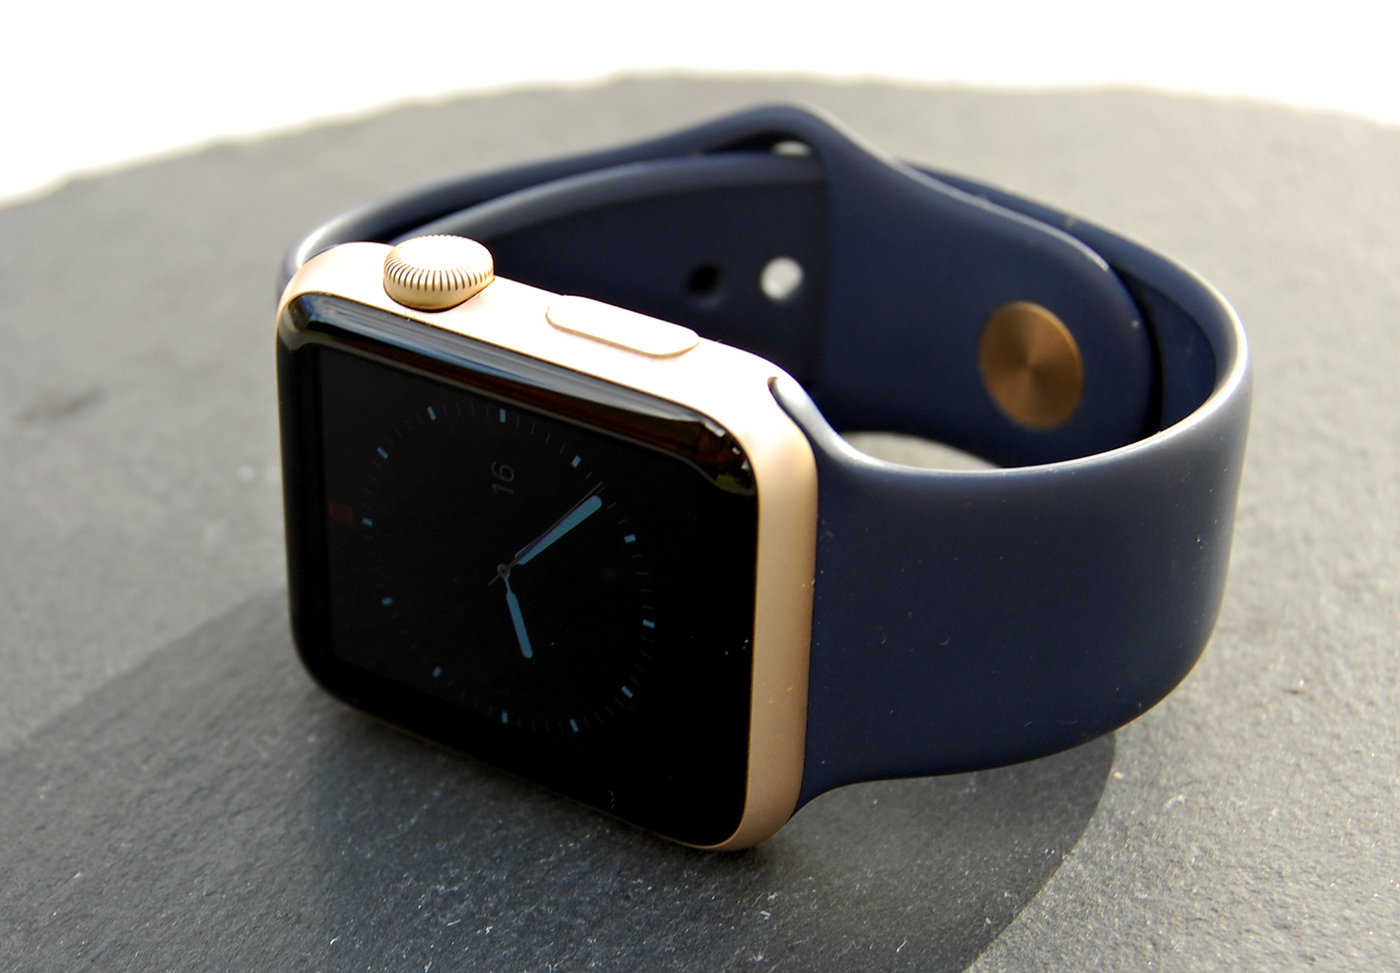 Applewatch1.